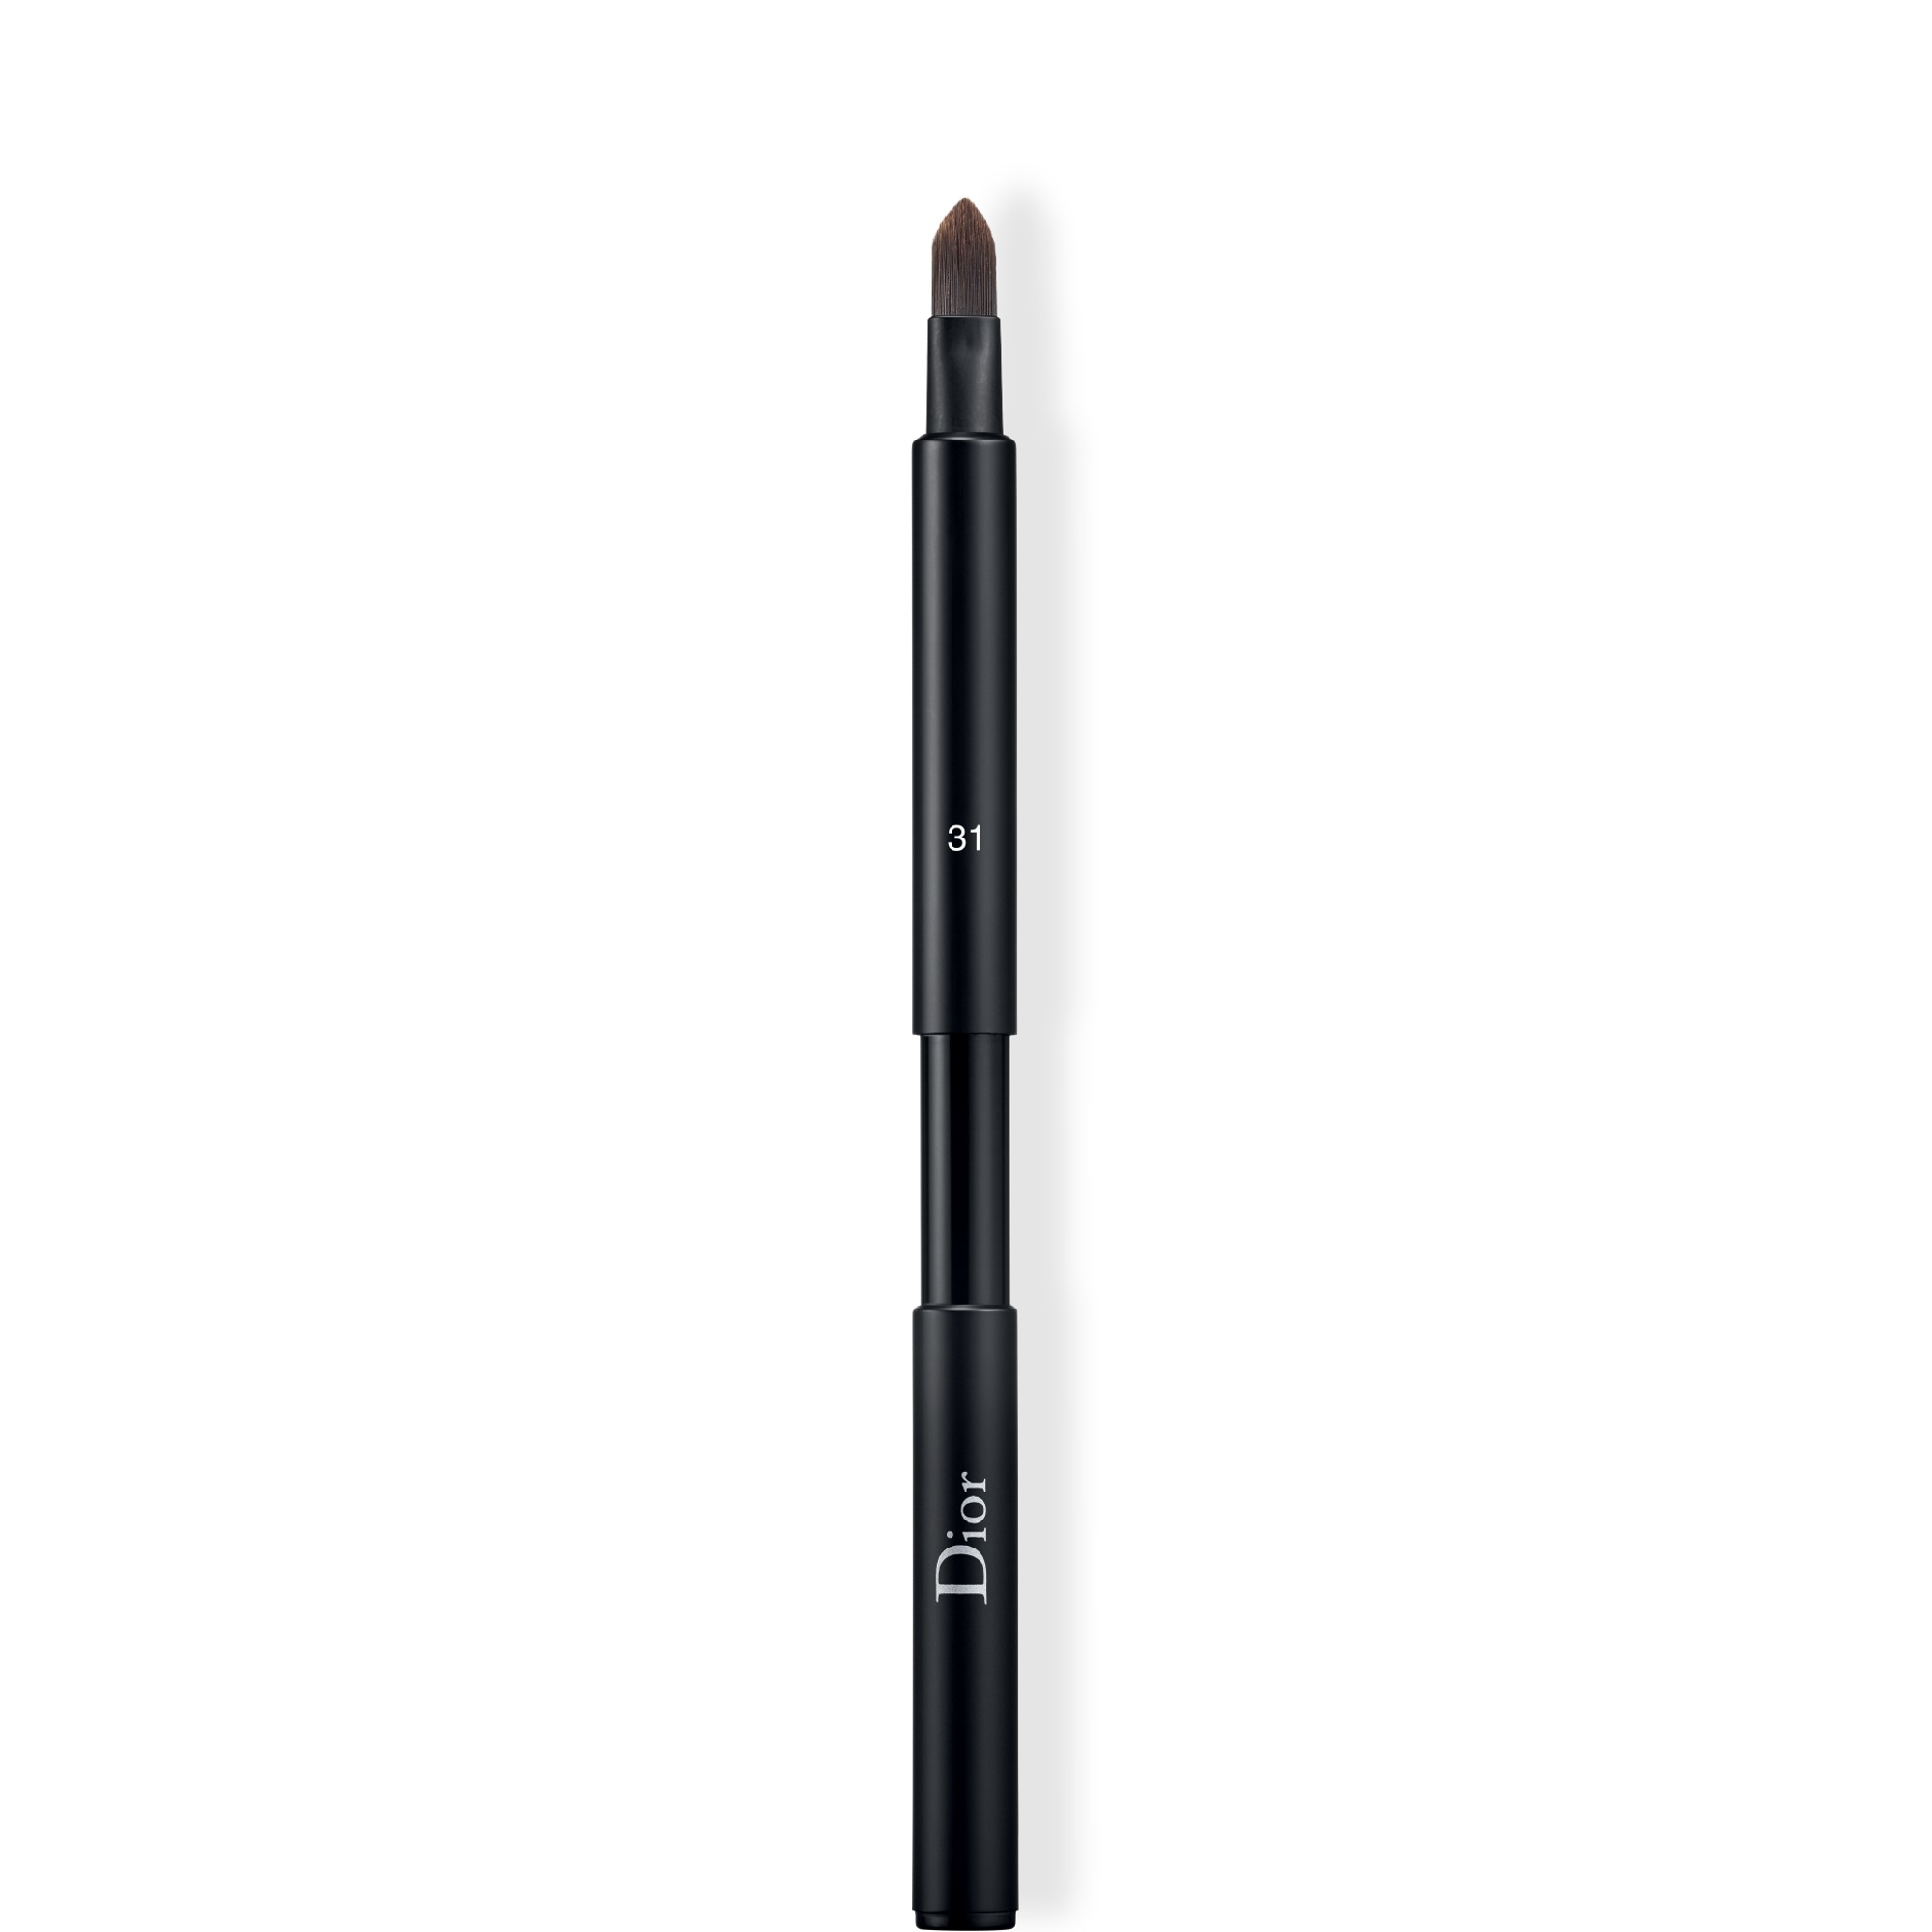 Retractable Lip Brush N° 31